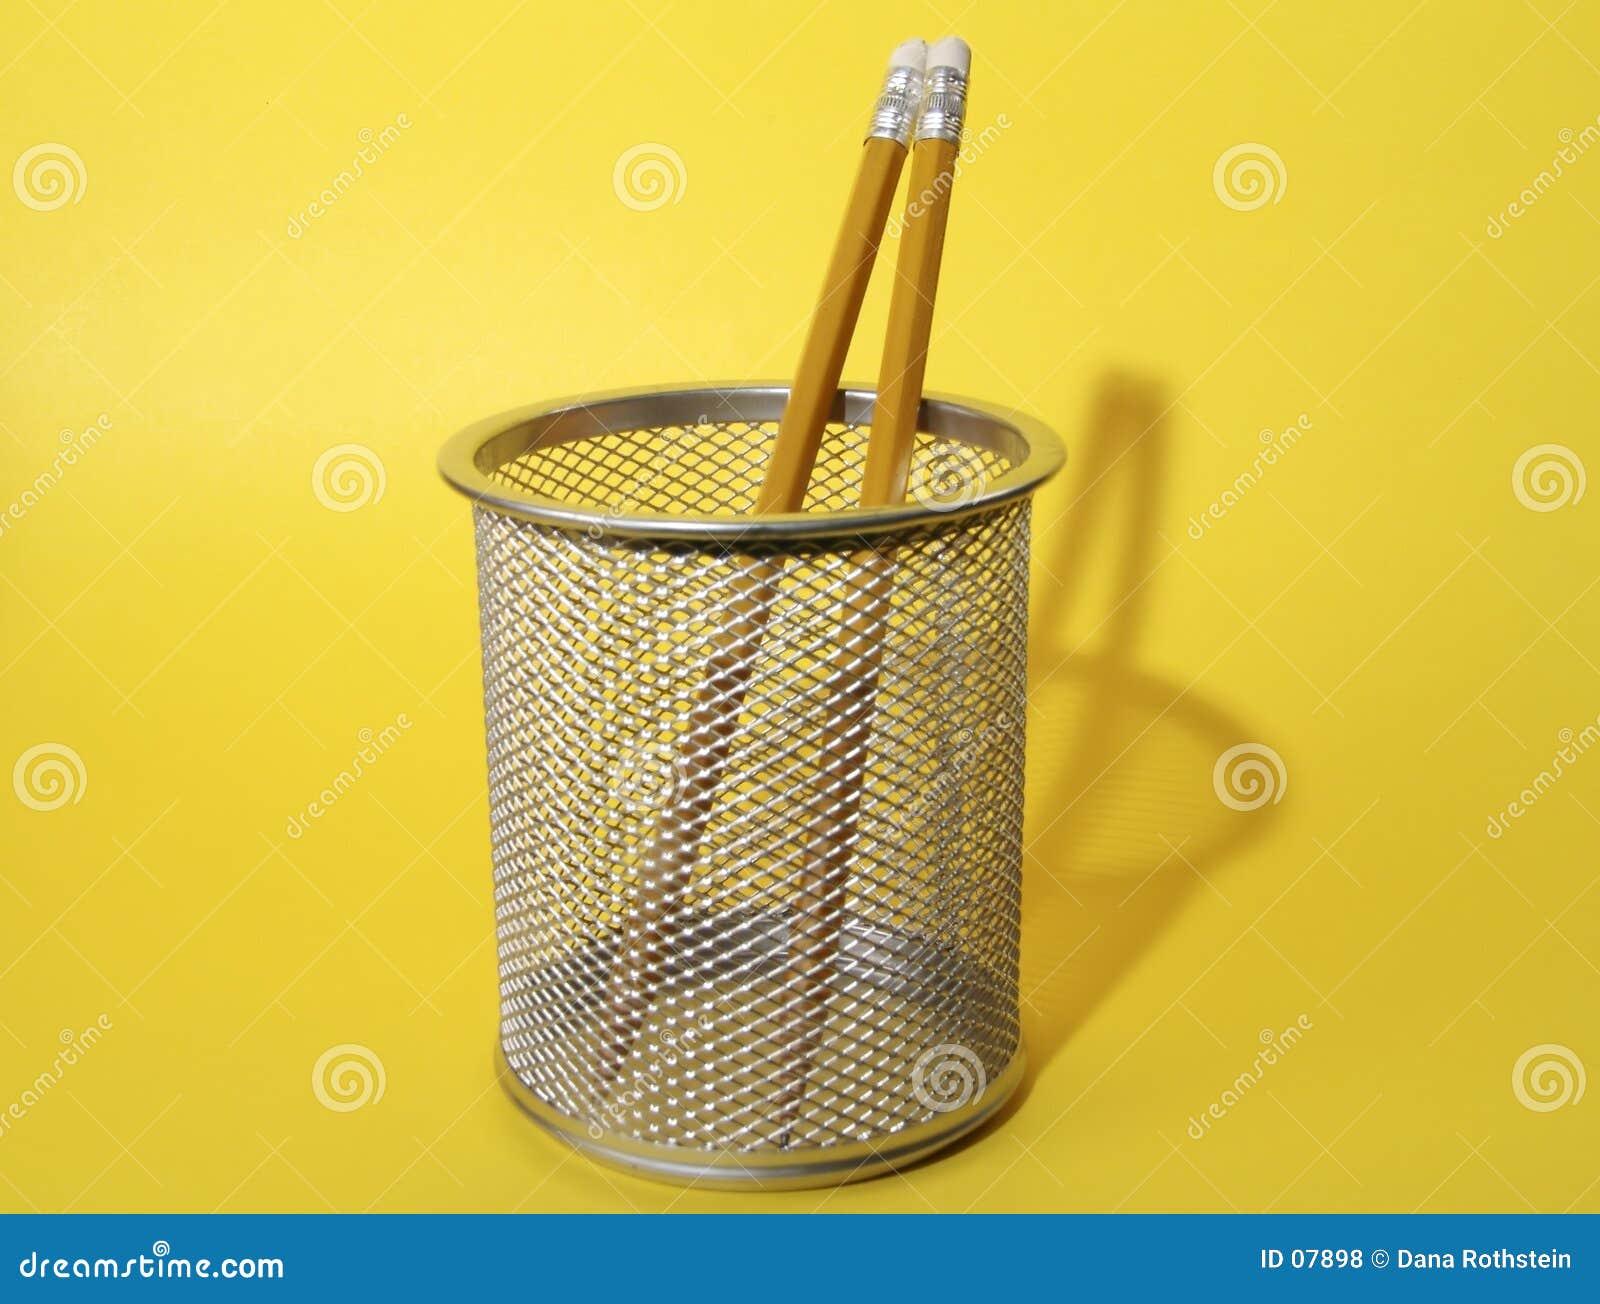 Pencils in Cup